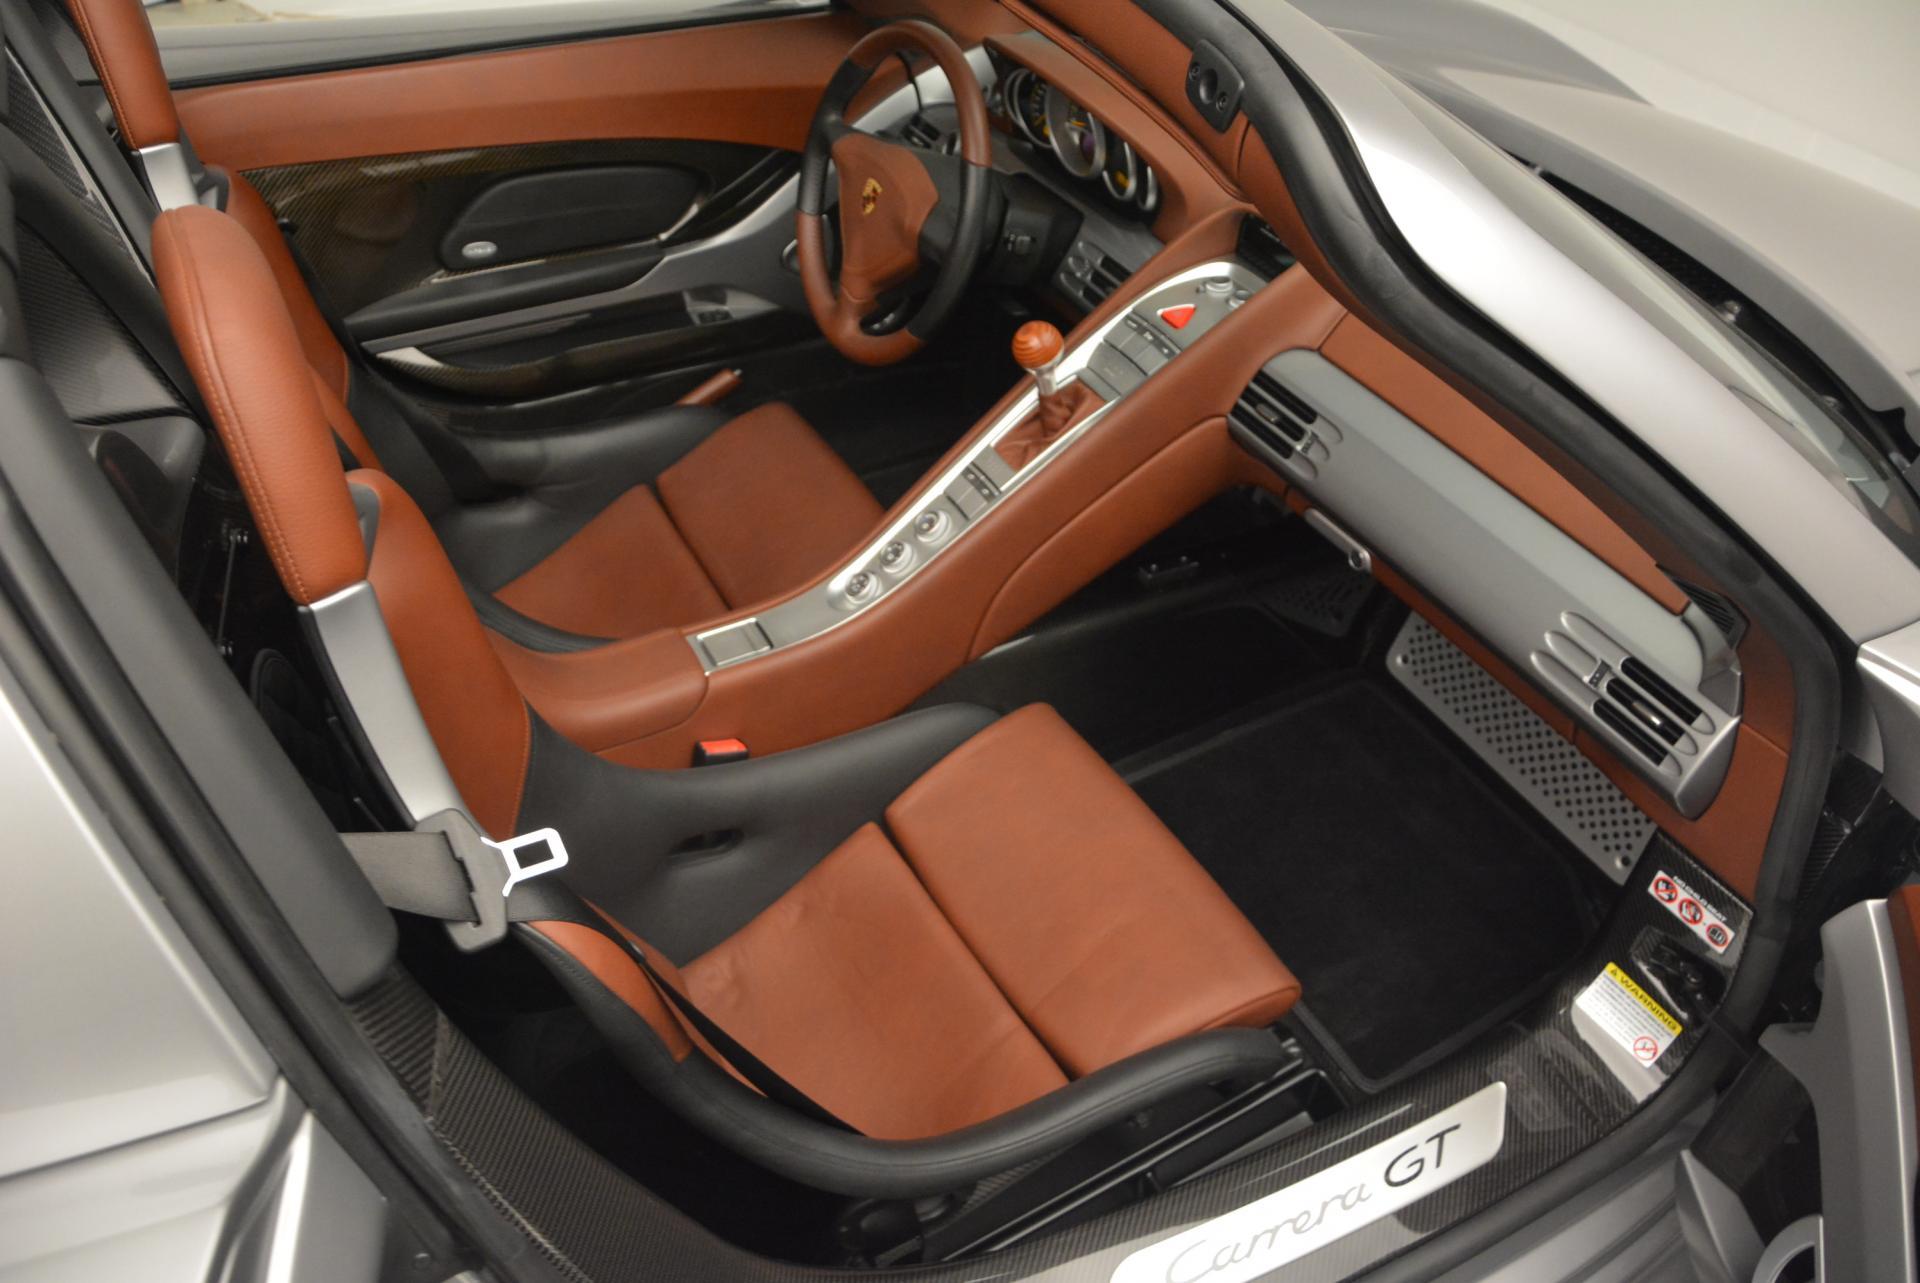 Used 2005 Porsche Carrera GT  For Sale In Greenwich, CT 108_p22